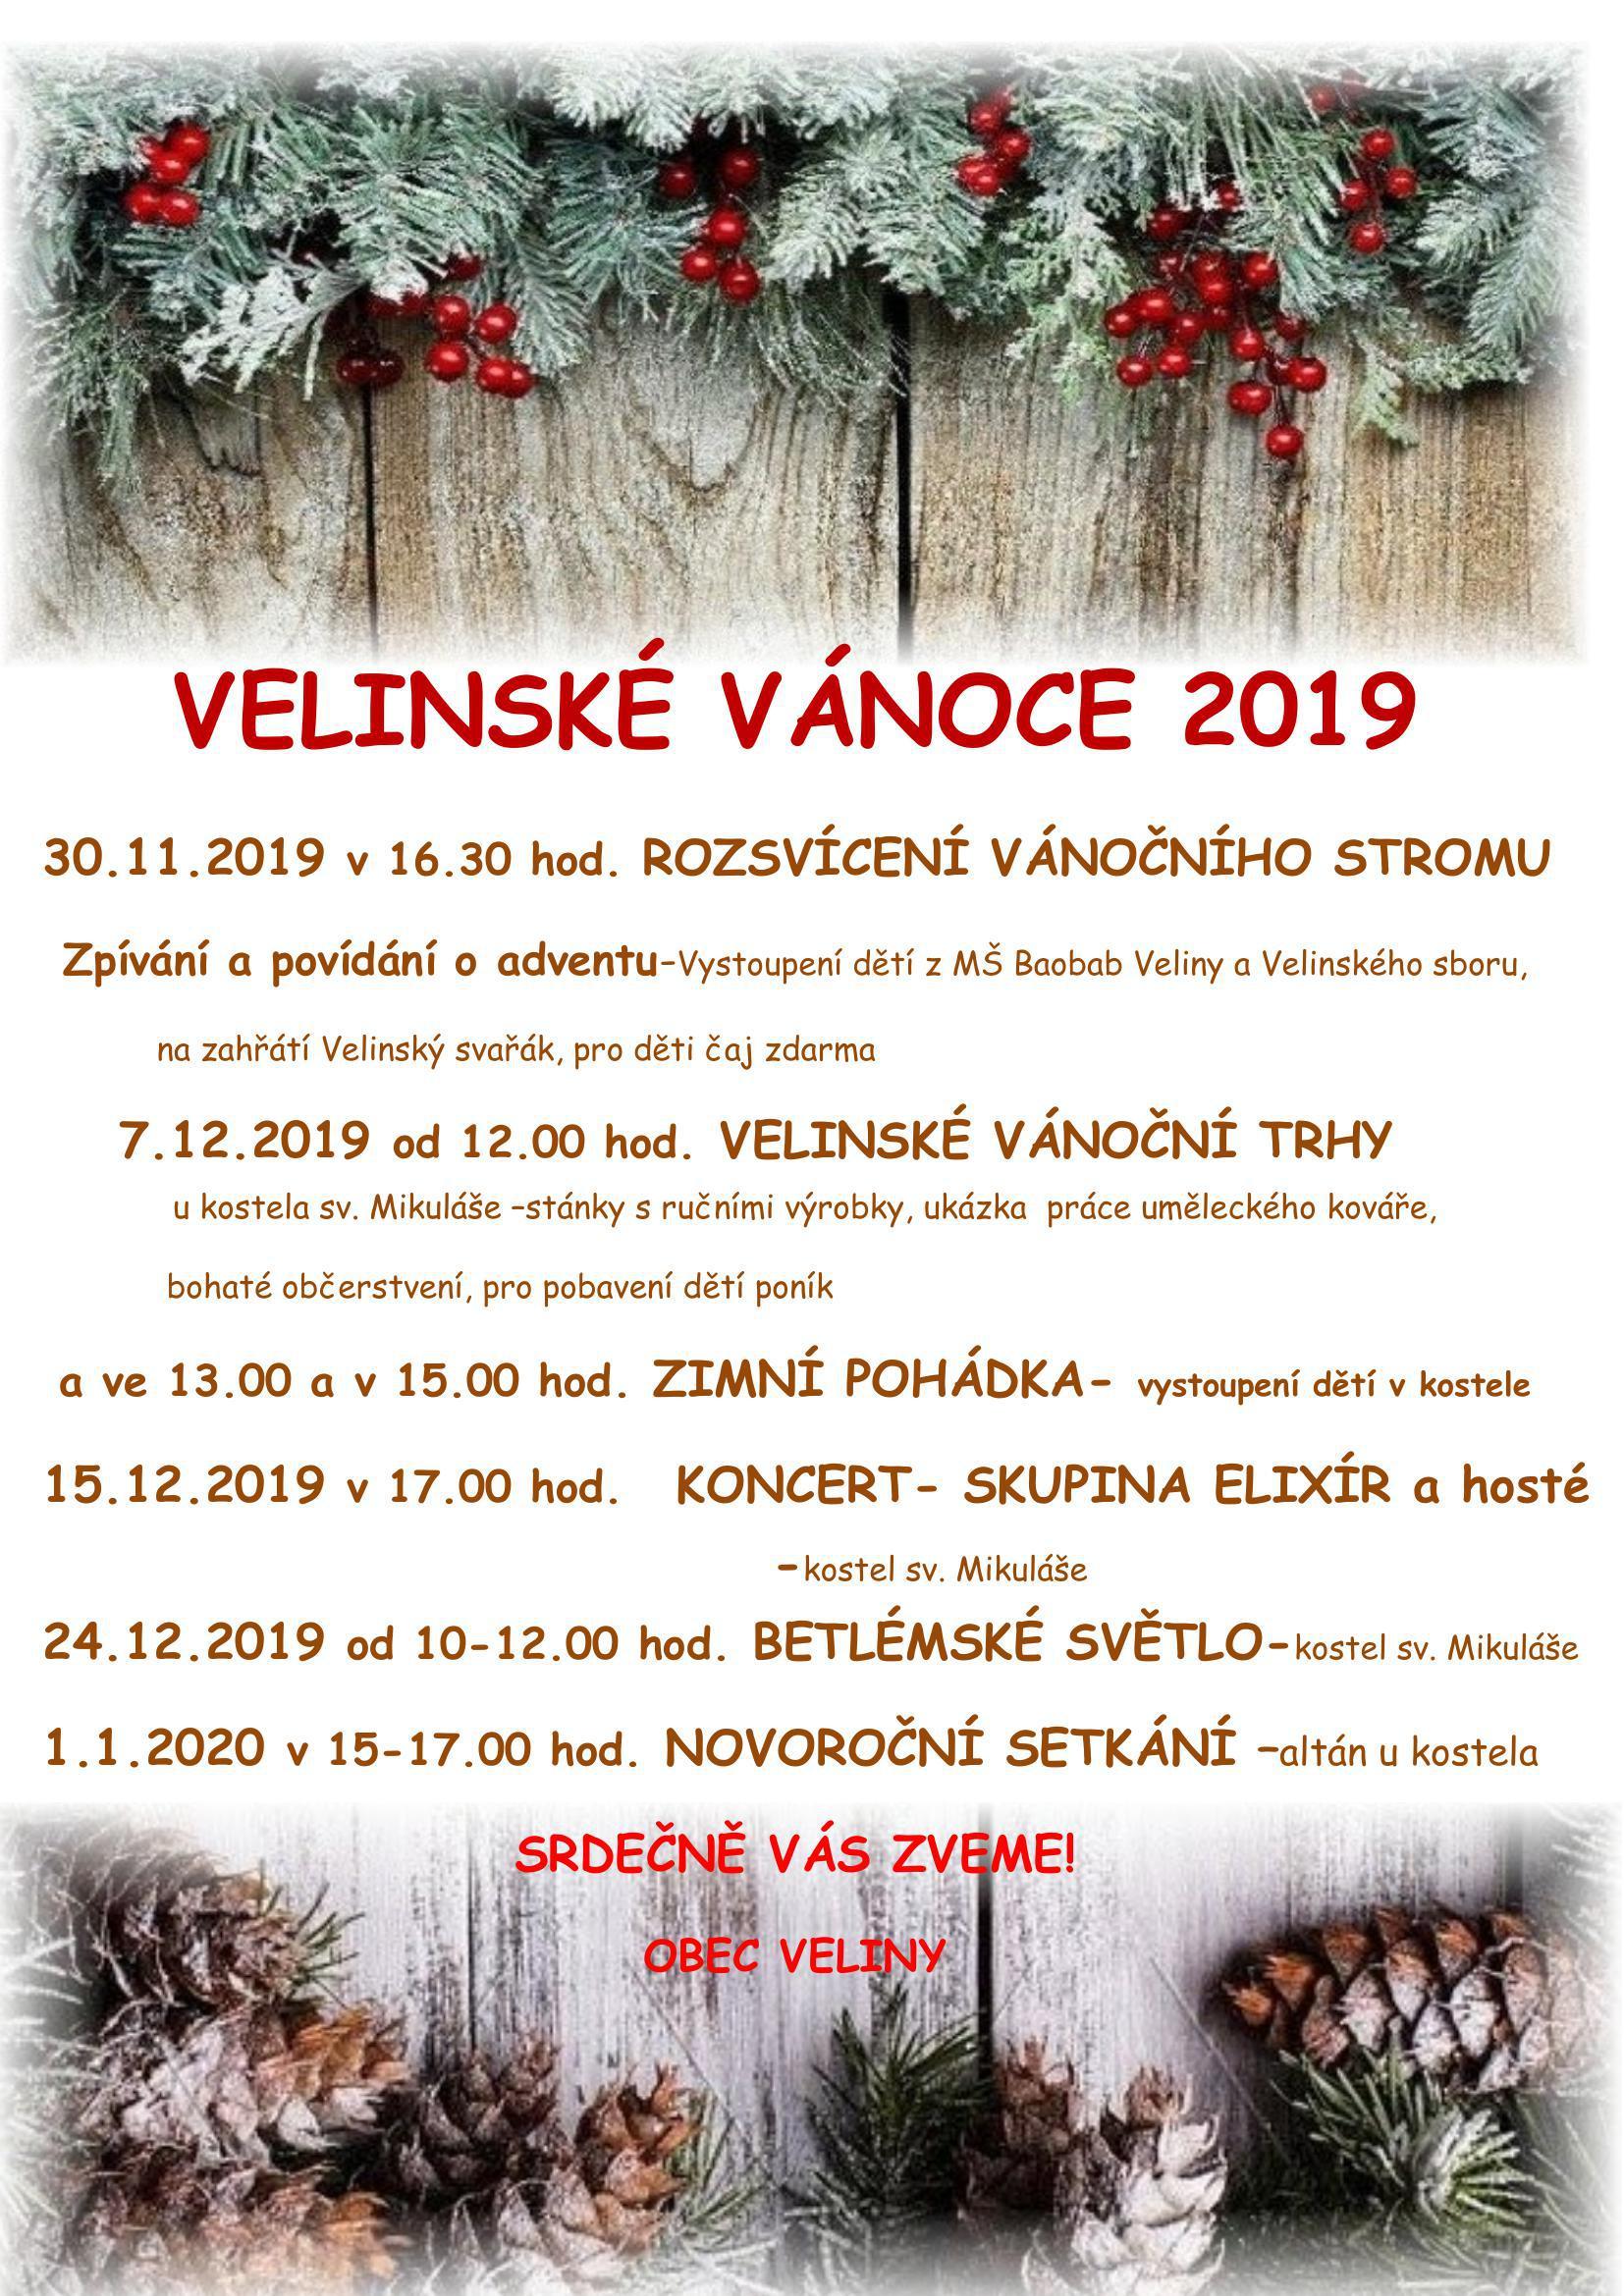 VELINSKE_VANOCE